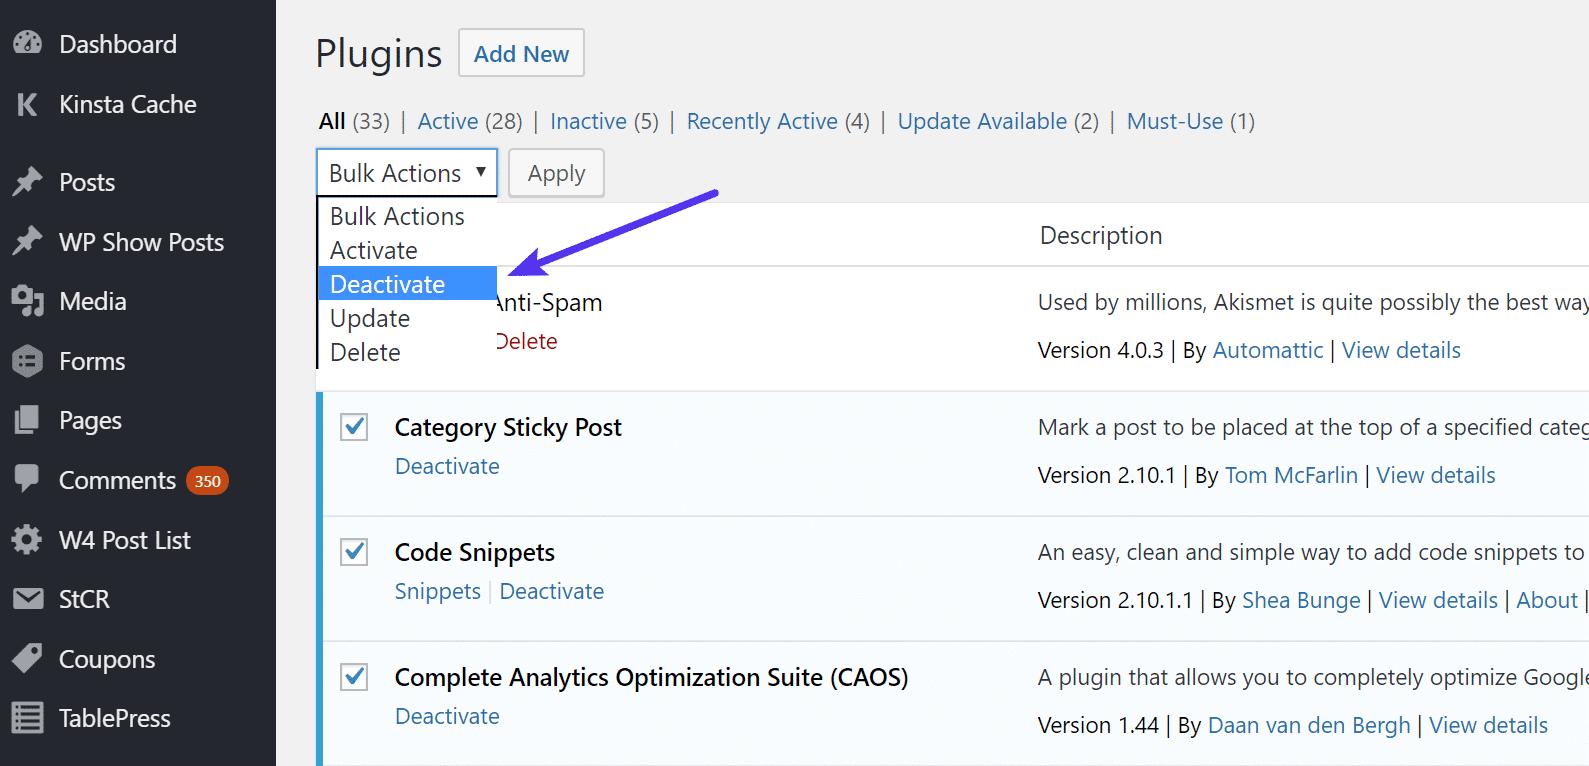 Inaktivera alla WordPress-plugin